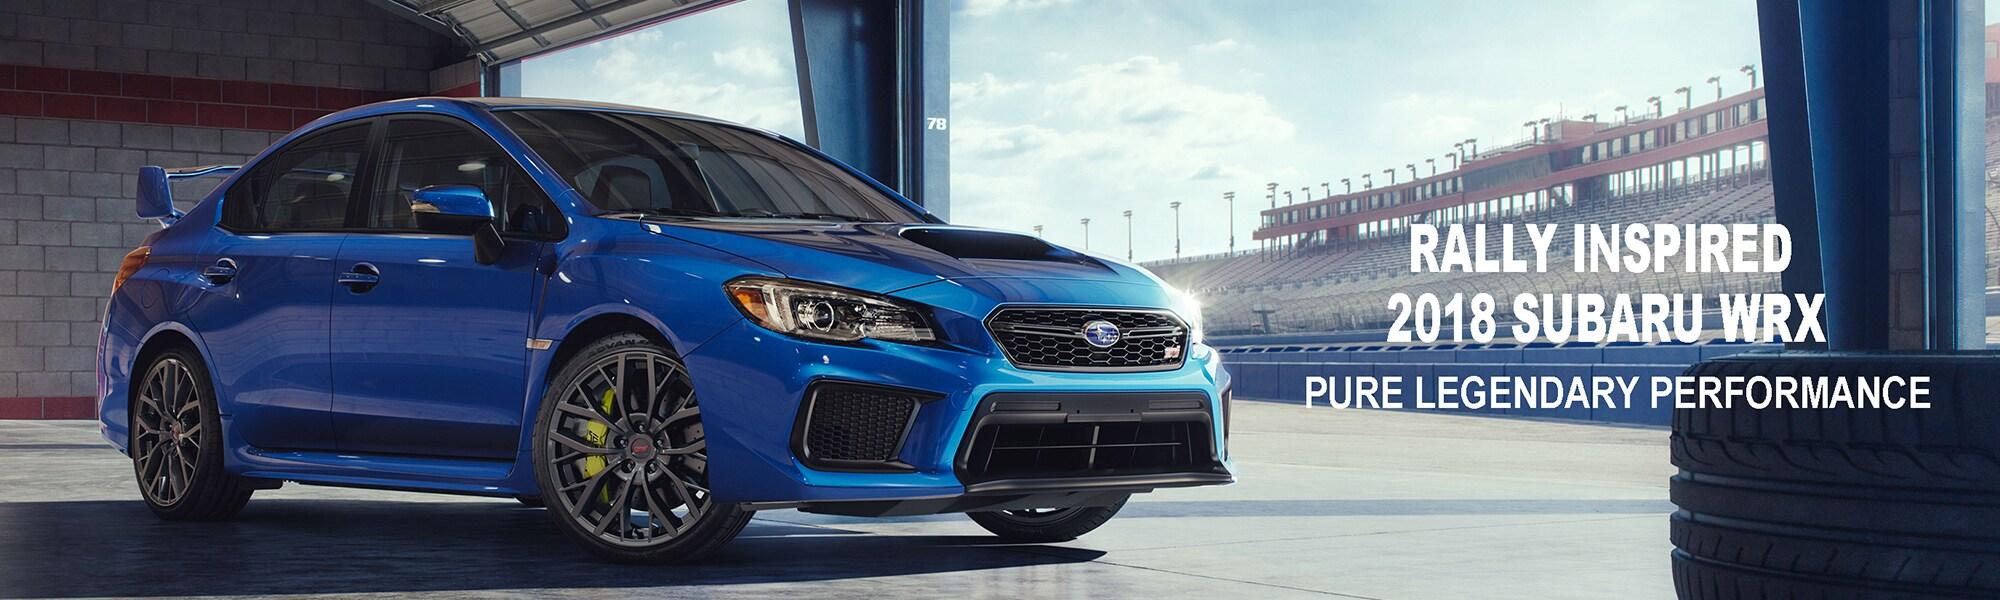 Subaru subaru pictures : Subaru of Maple | New Subaru dealership in Vaughan, ON L6A 4V3